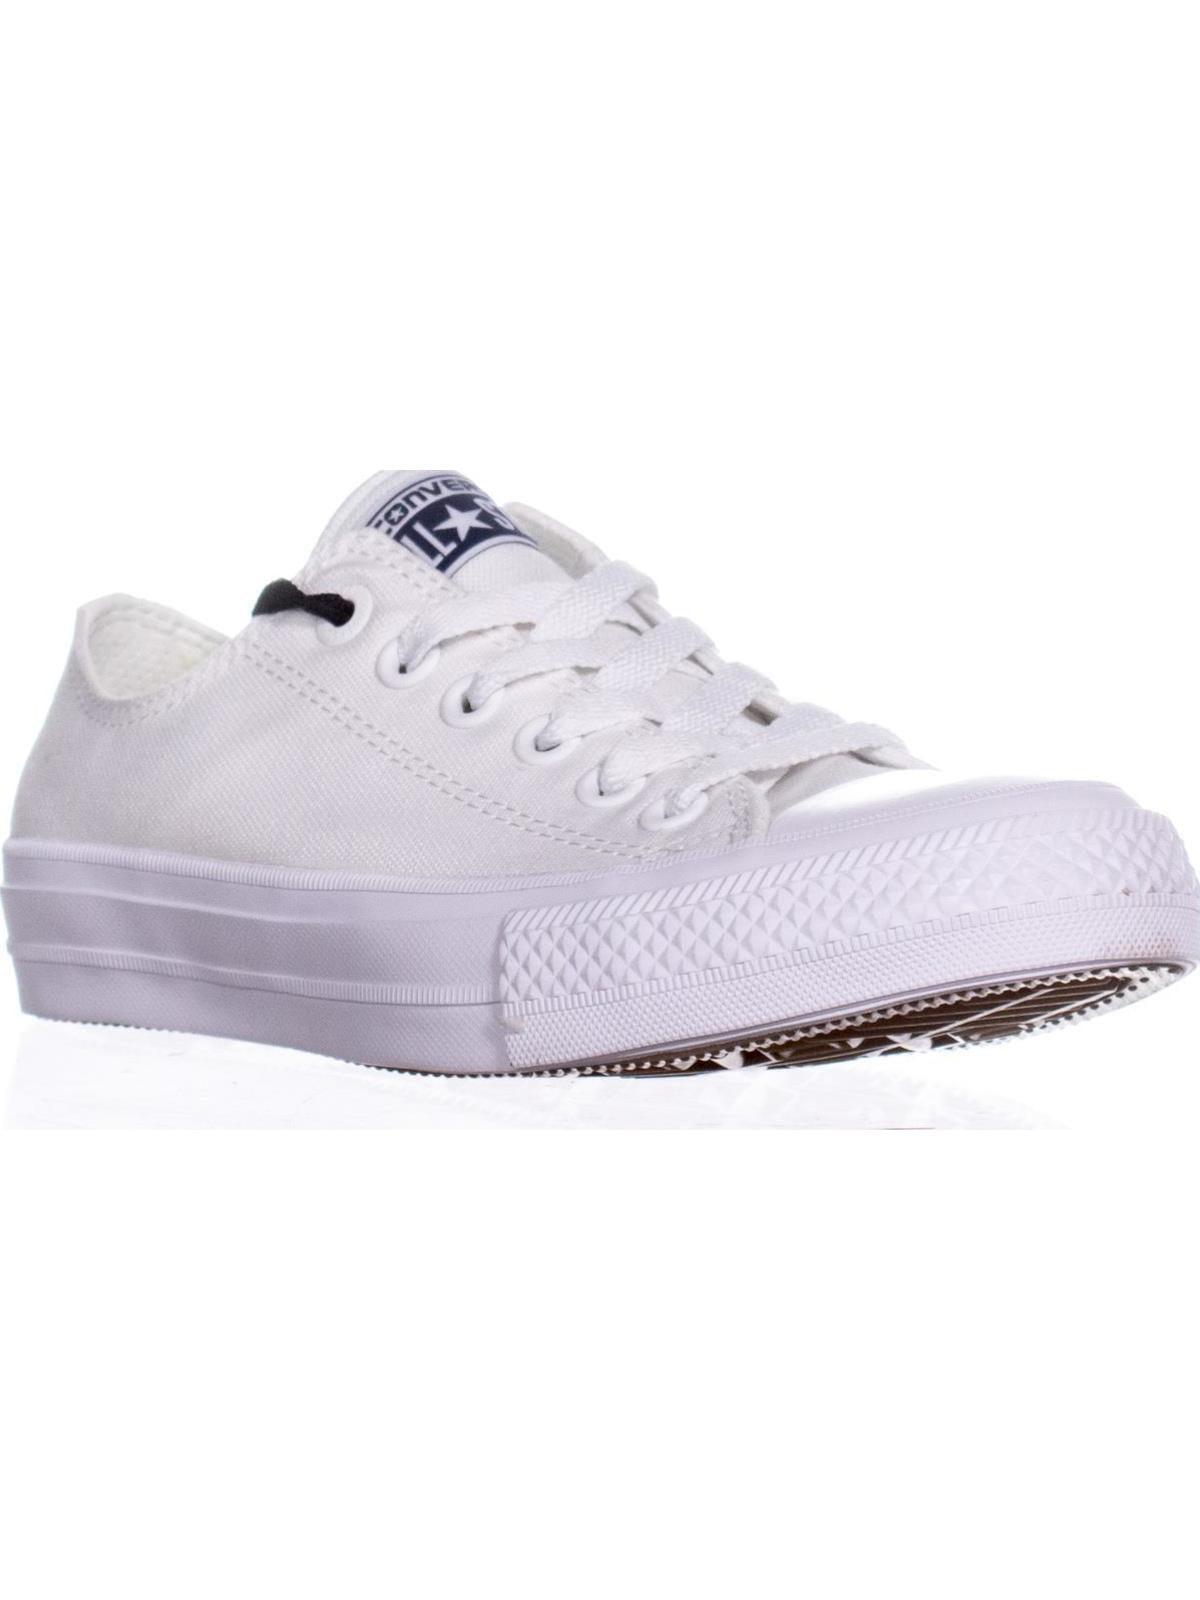 Womens Converse II Chuck Taylor All Star II Converse Oxford Sneakers, White cdff75